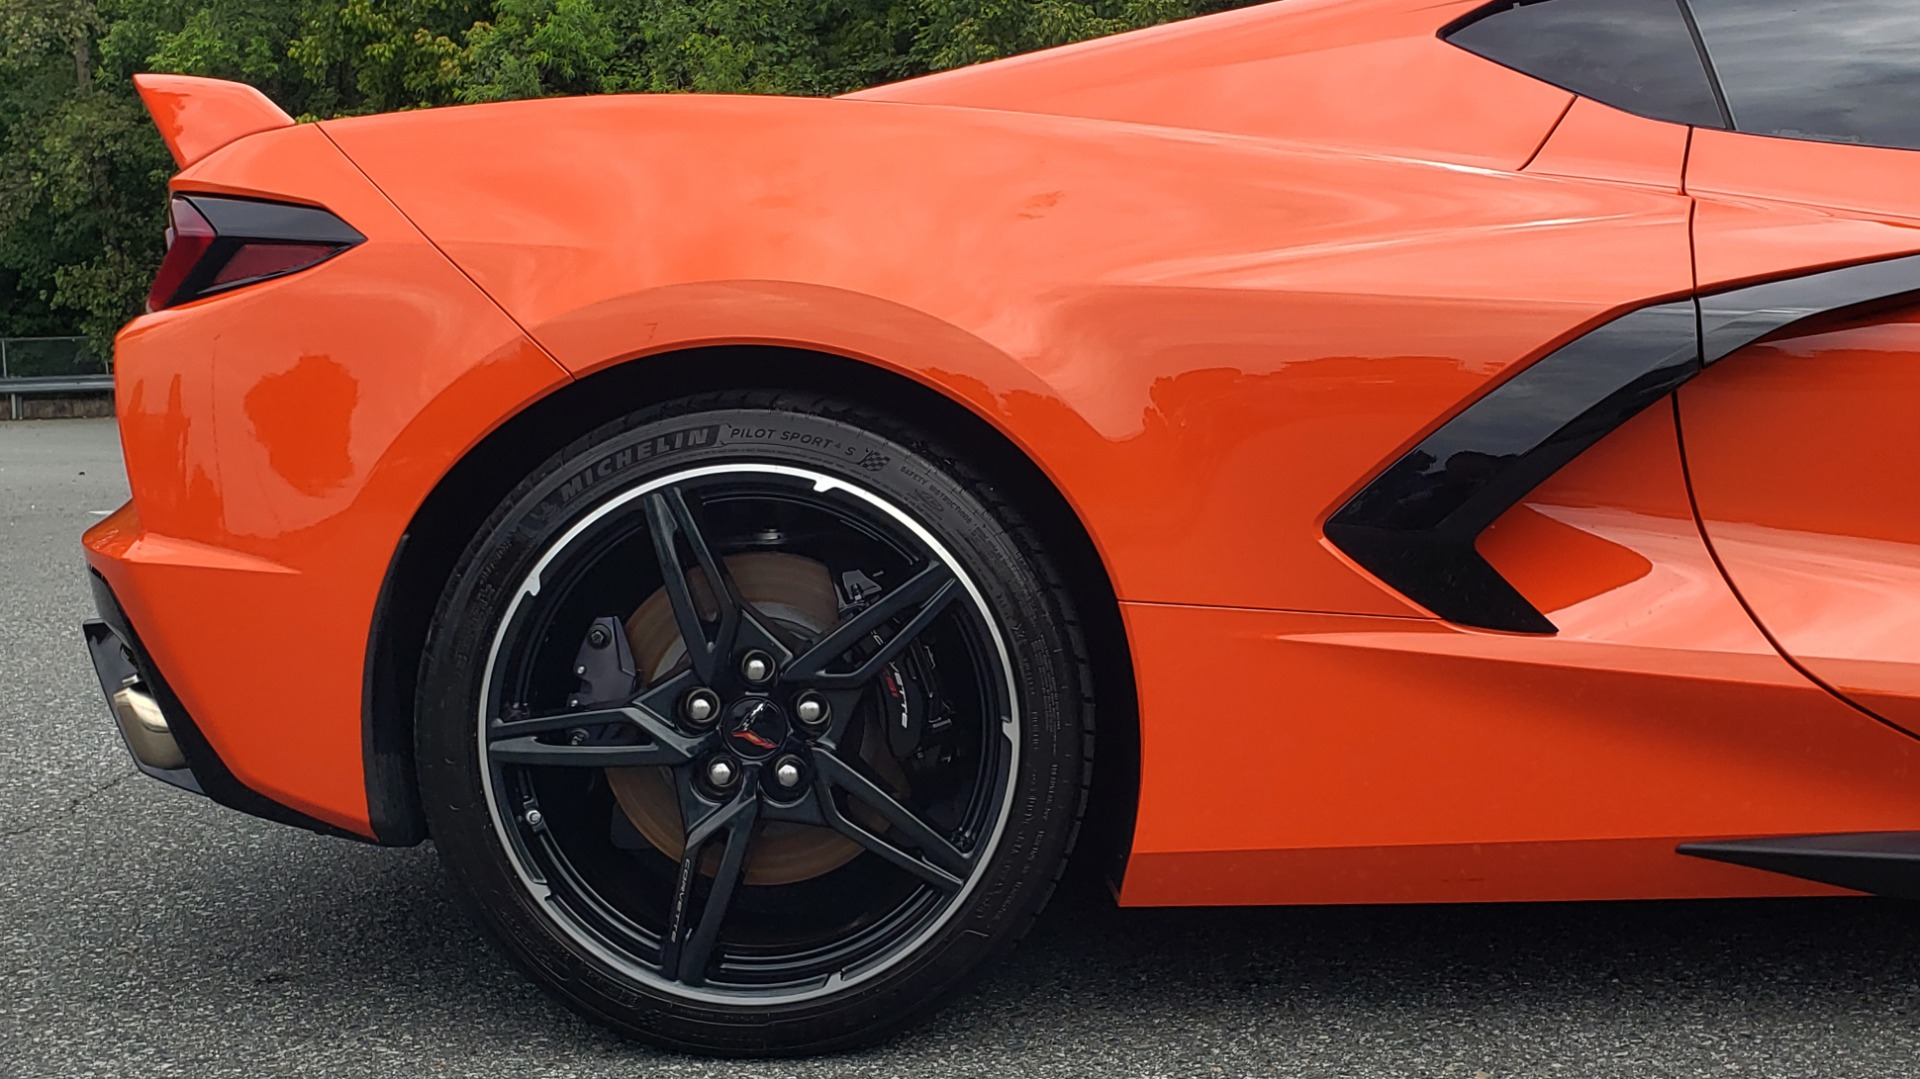 Used 2020 Chevrolet CORVETTE C8 STINGRAY 2LT / 6.2L V8 / 8-SPD AUTO / NAV / BOSE / REARVIEW / DATA RECOR for sale Sold at Formula Imports in Charlotte NC 28227 85